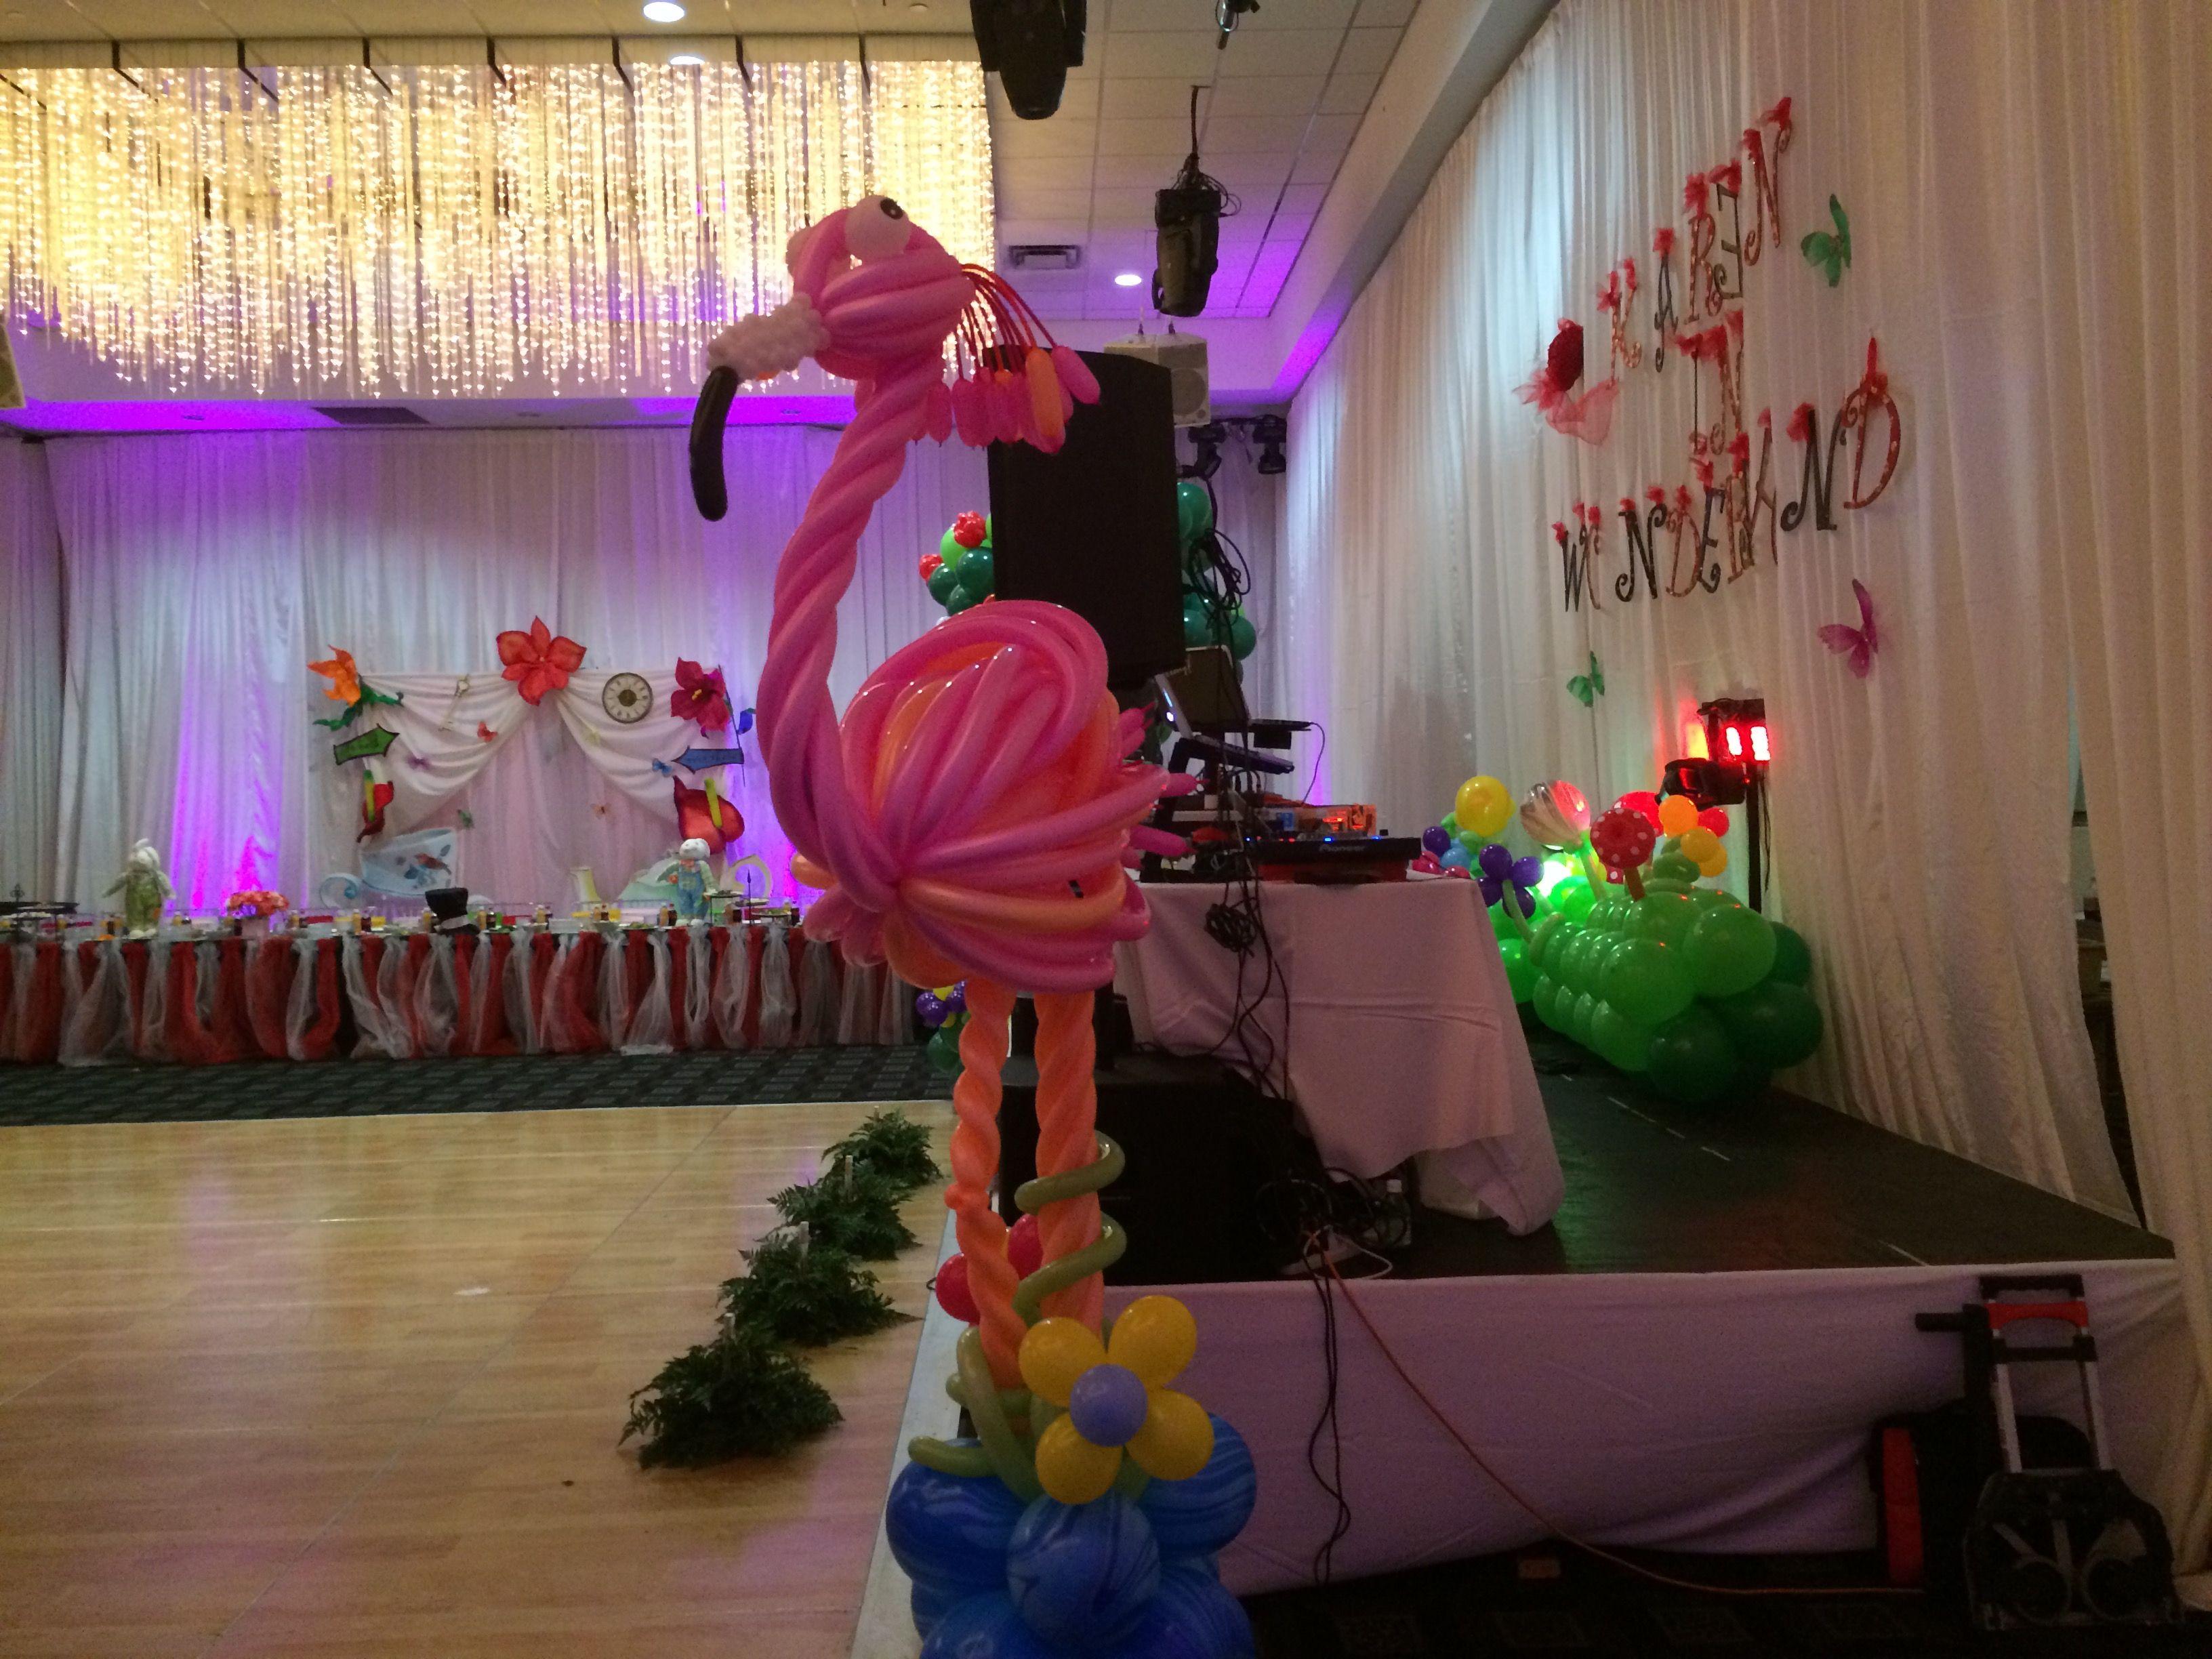 Alice In Wonderland Themed Party Decoration Ideas Wwwdreamarkeventscoml #Thecheshirecat #Madhatter